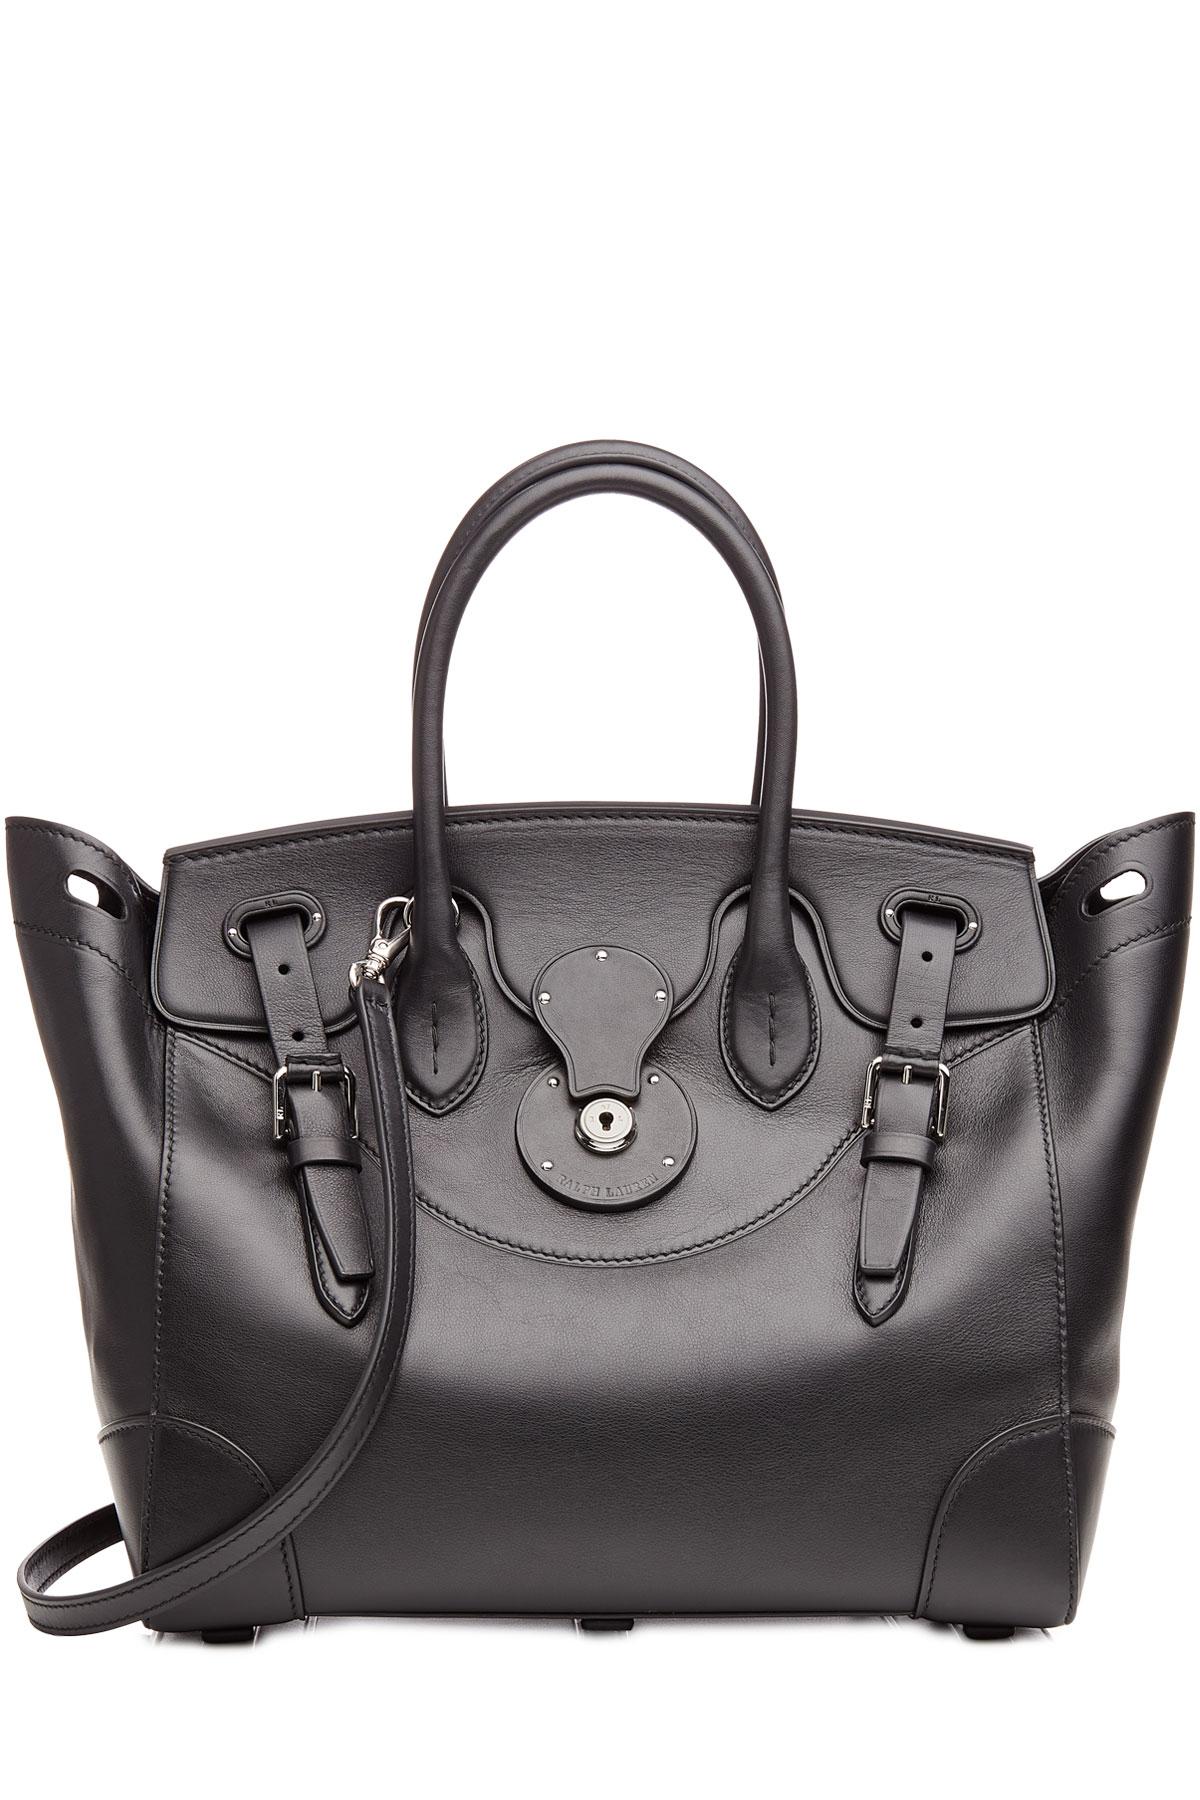 Ralph Lauren Collection Soft Ricky Handbag Leather 27 XZnAA